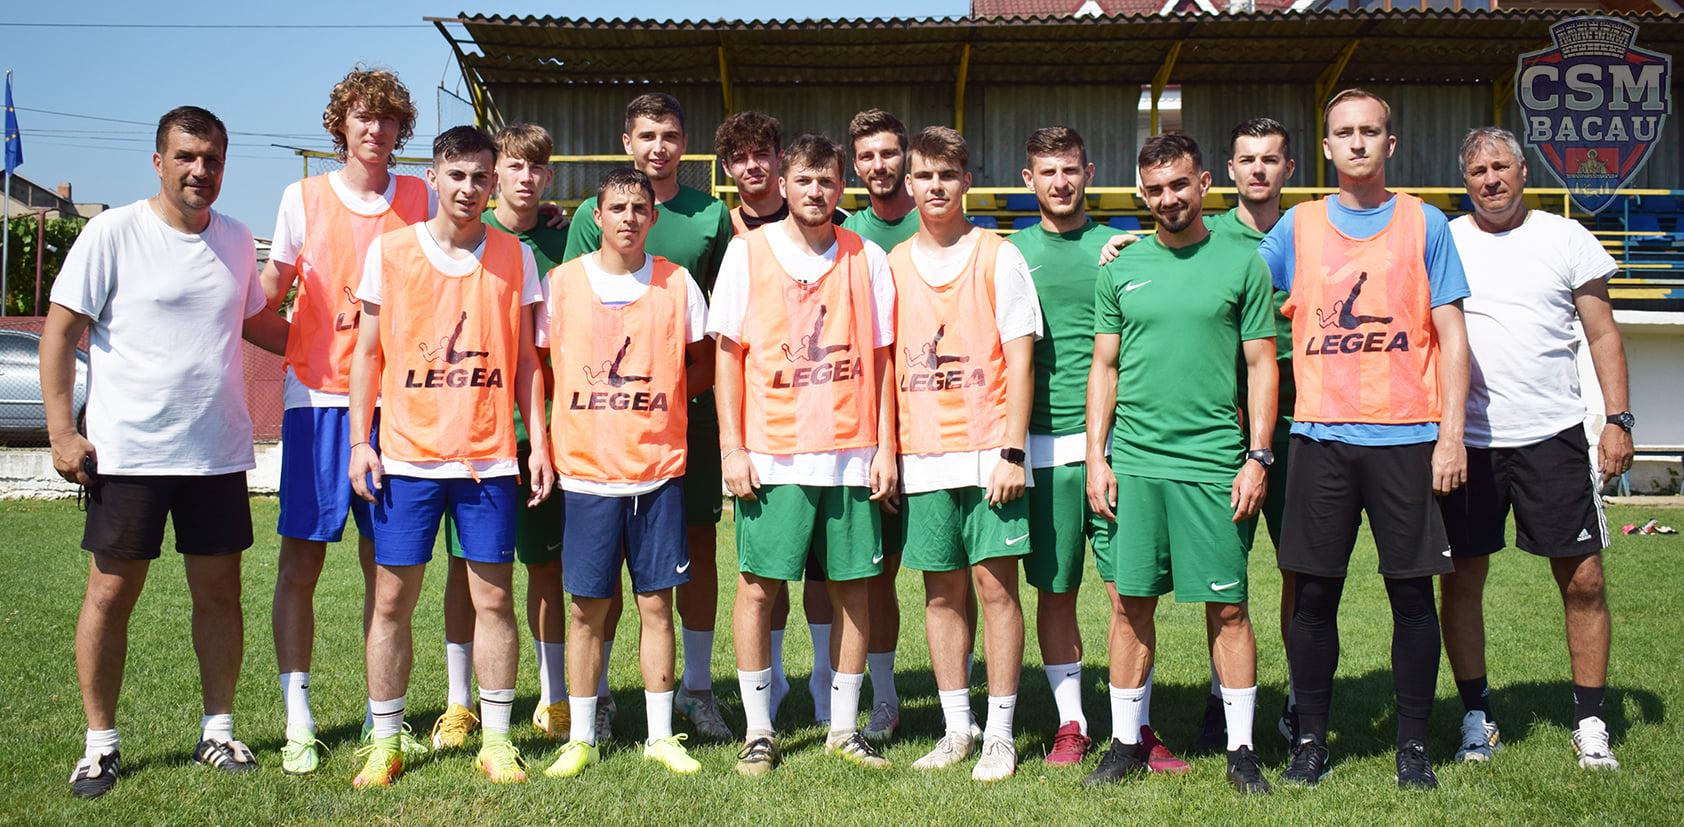 Fotbal - CSM Bacau - Echipa